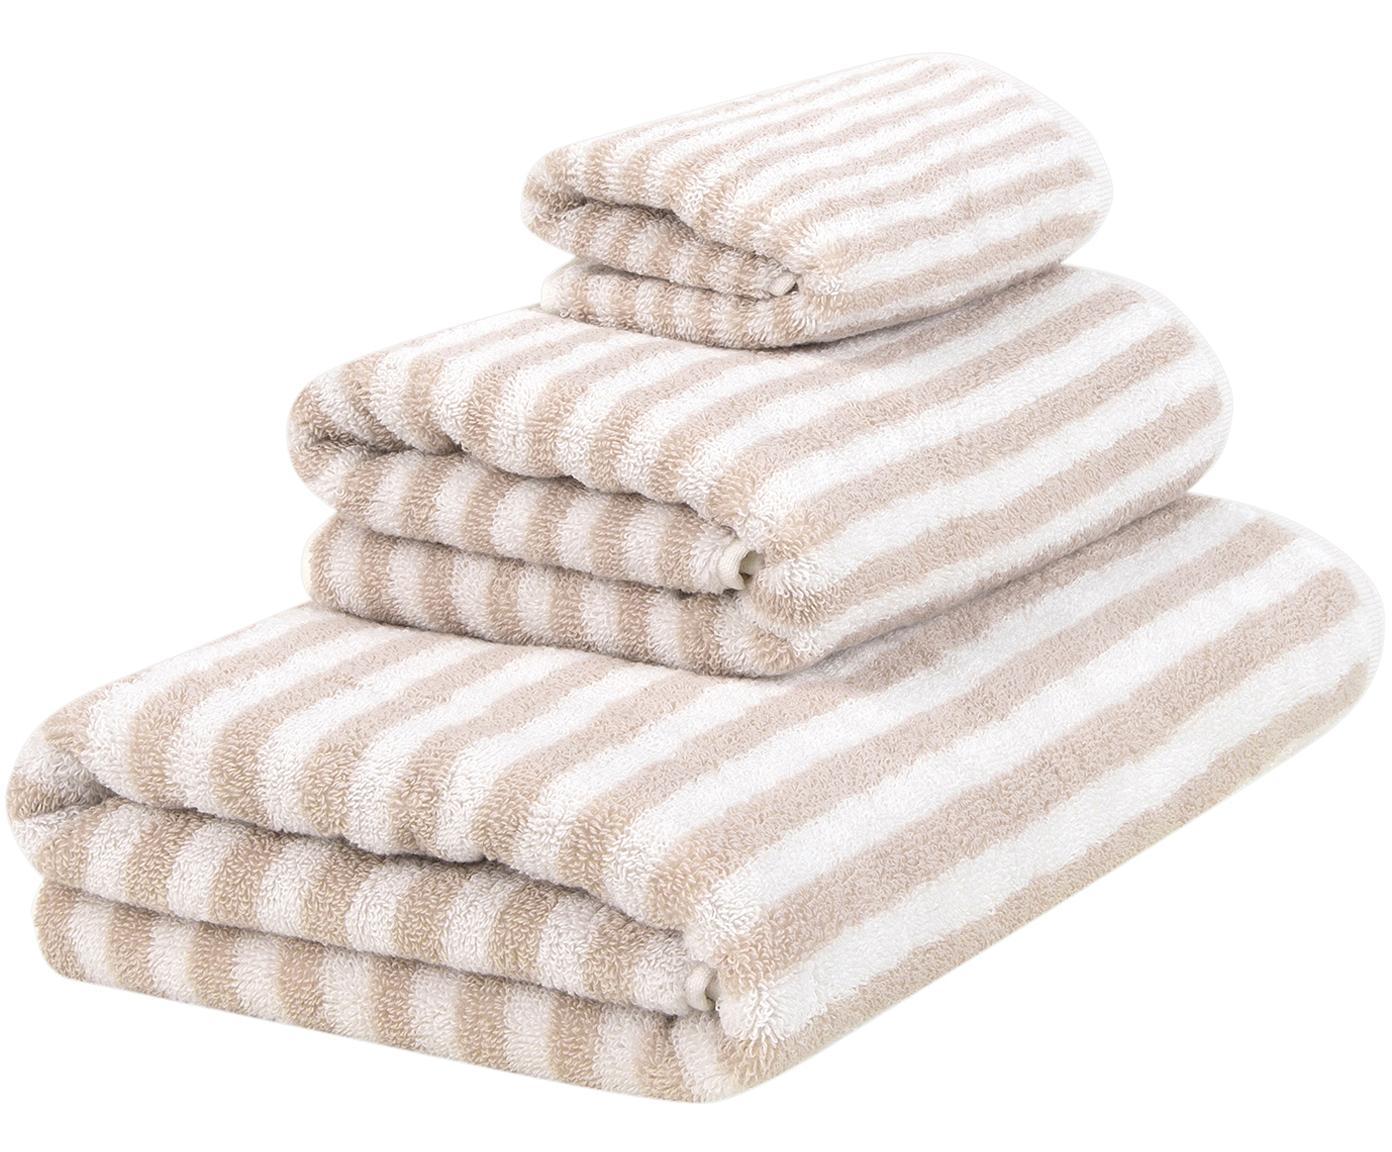 Set asciugamani reversibili Viola 3 pz, Sabbia, bianco crema, Diverse dimensioni